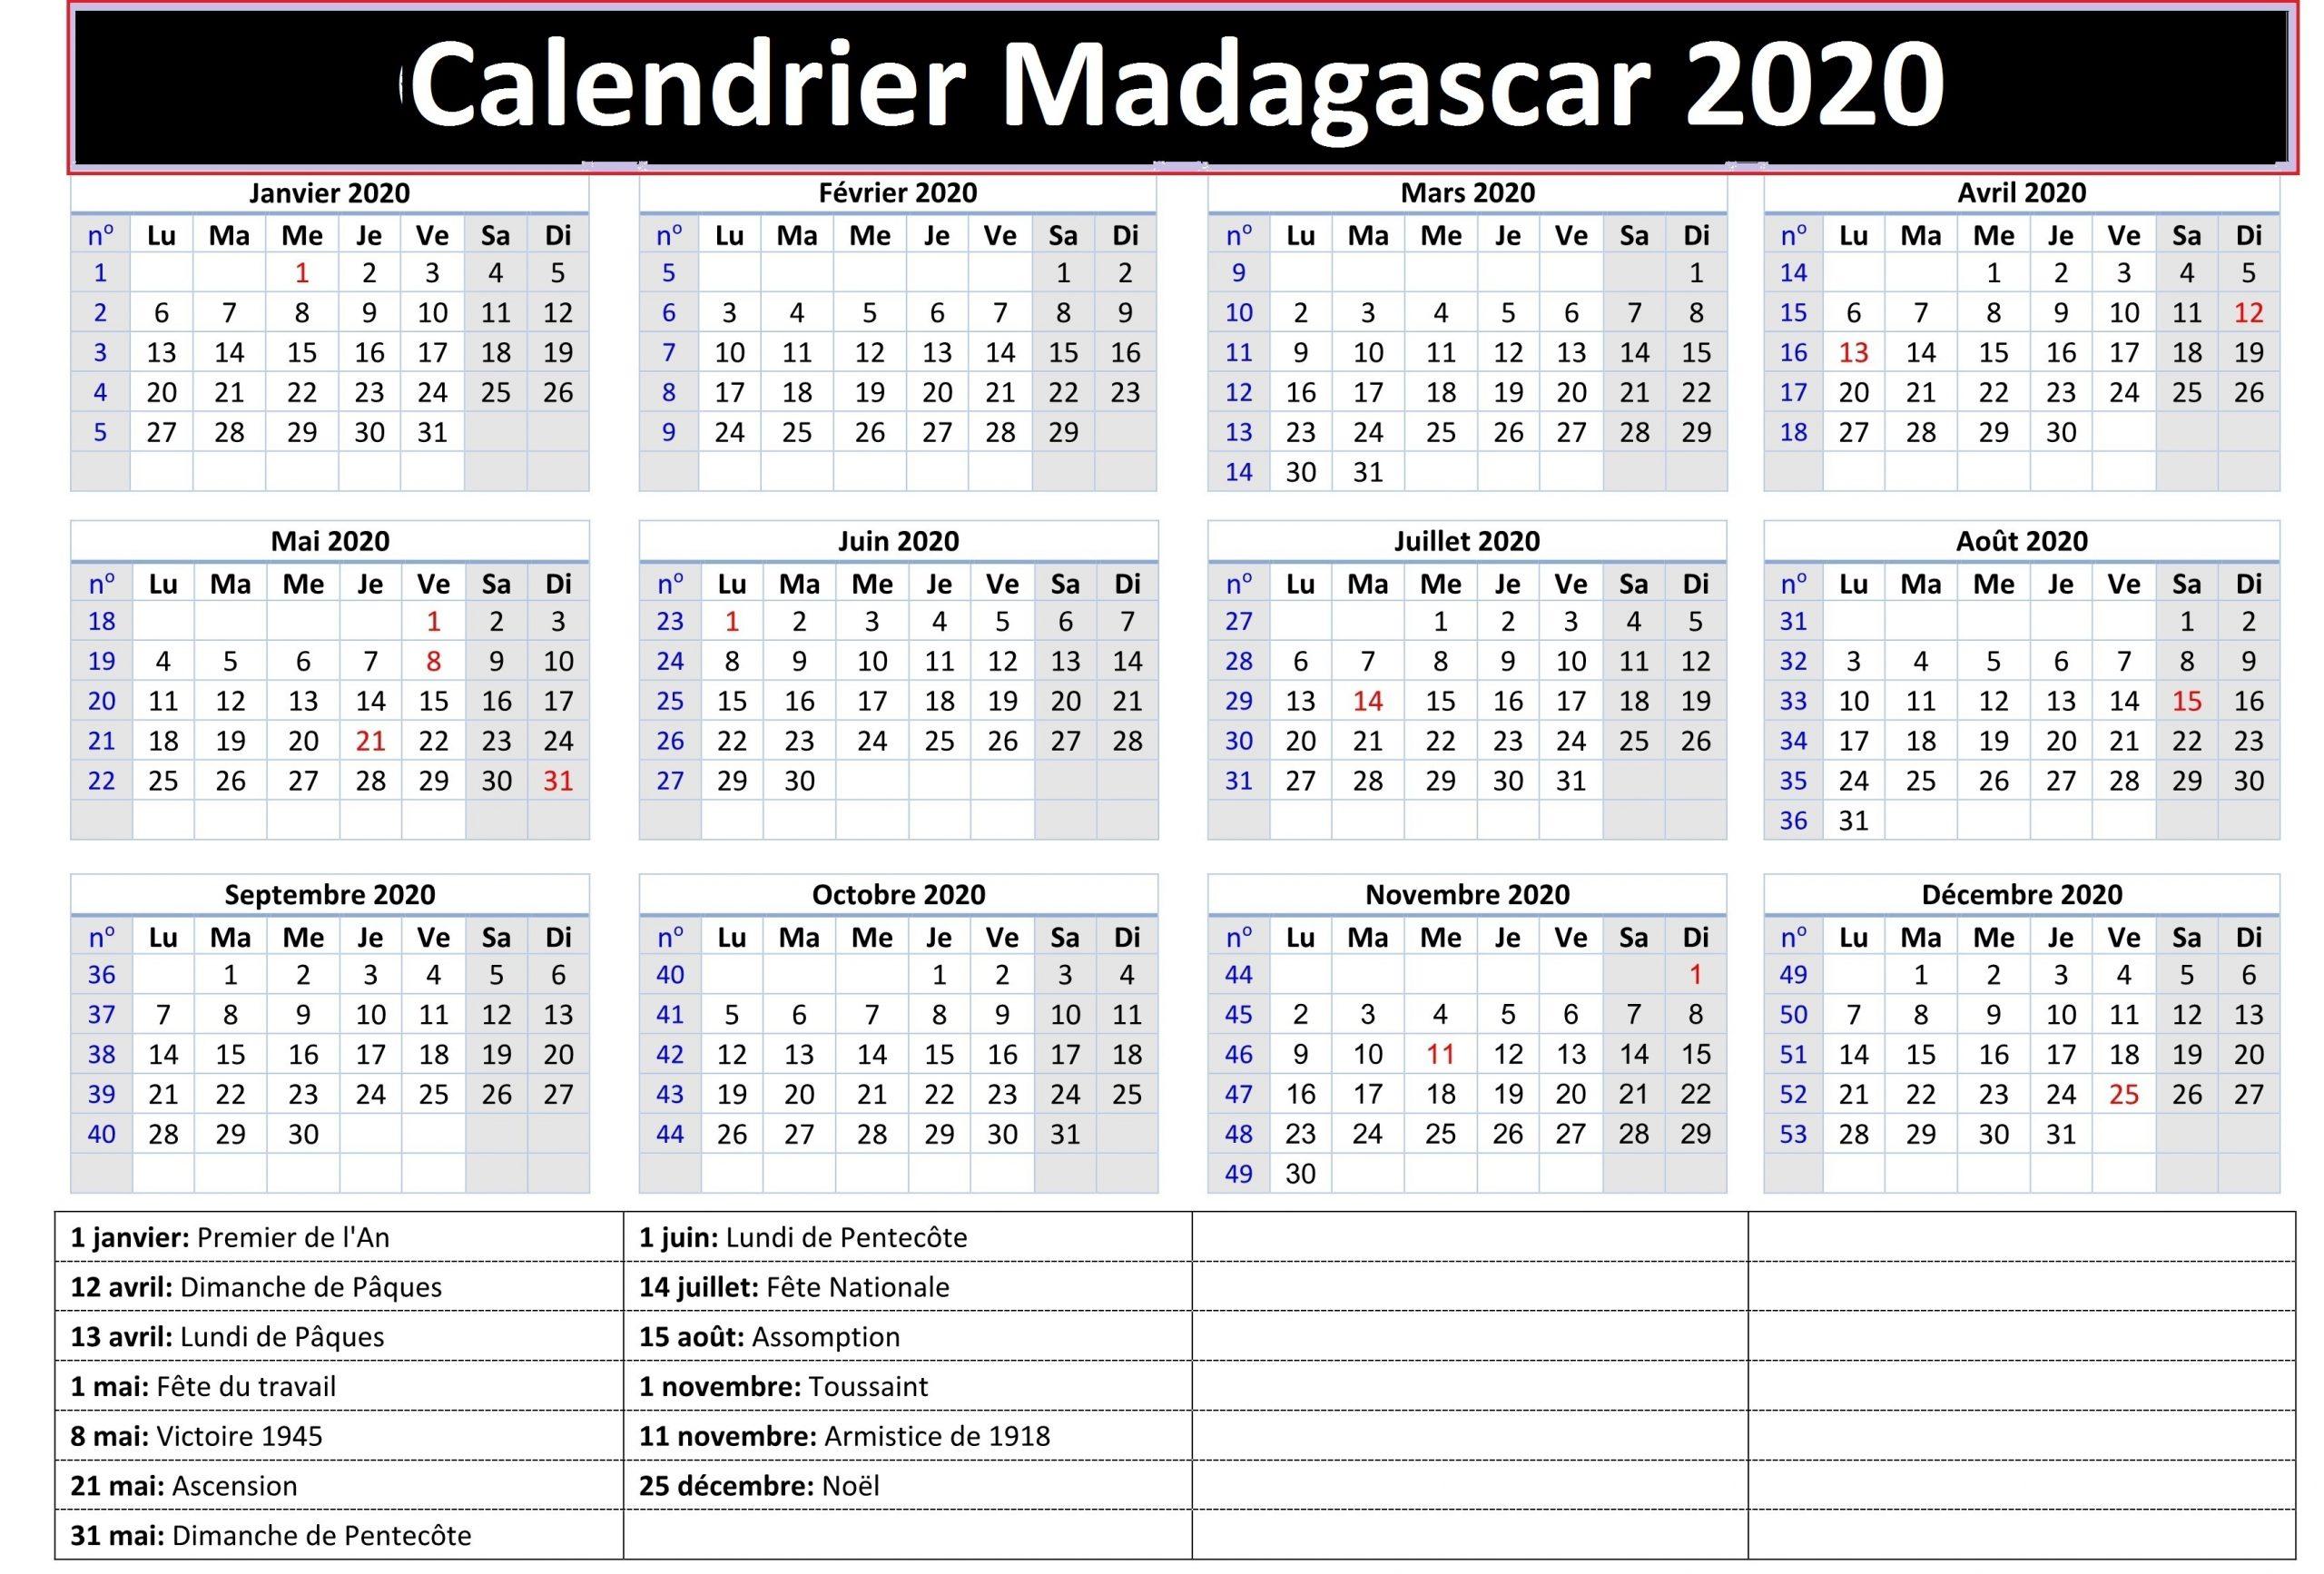 Calendrier Examen Officiel Madagascar 2020